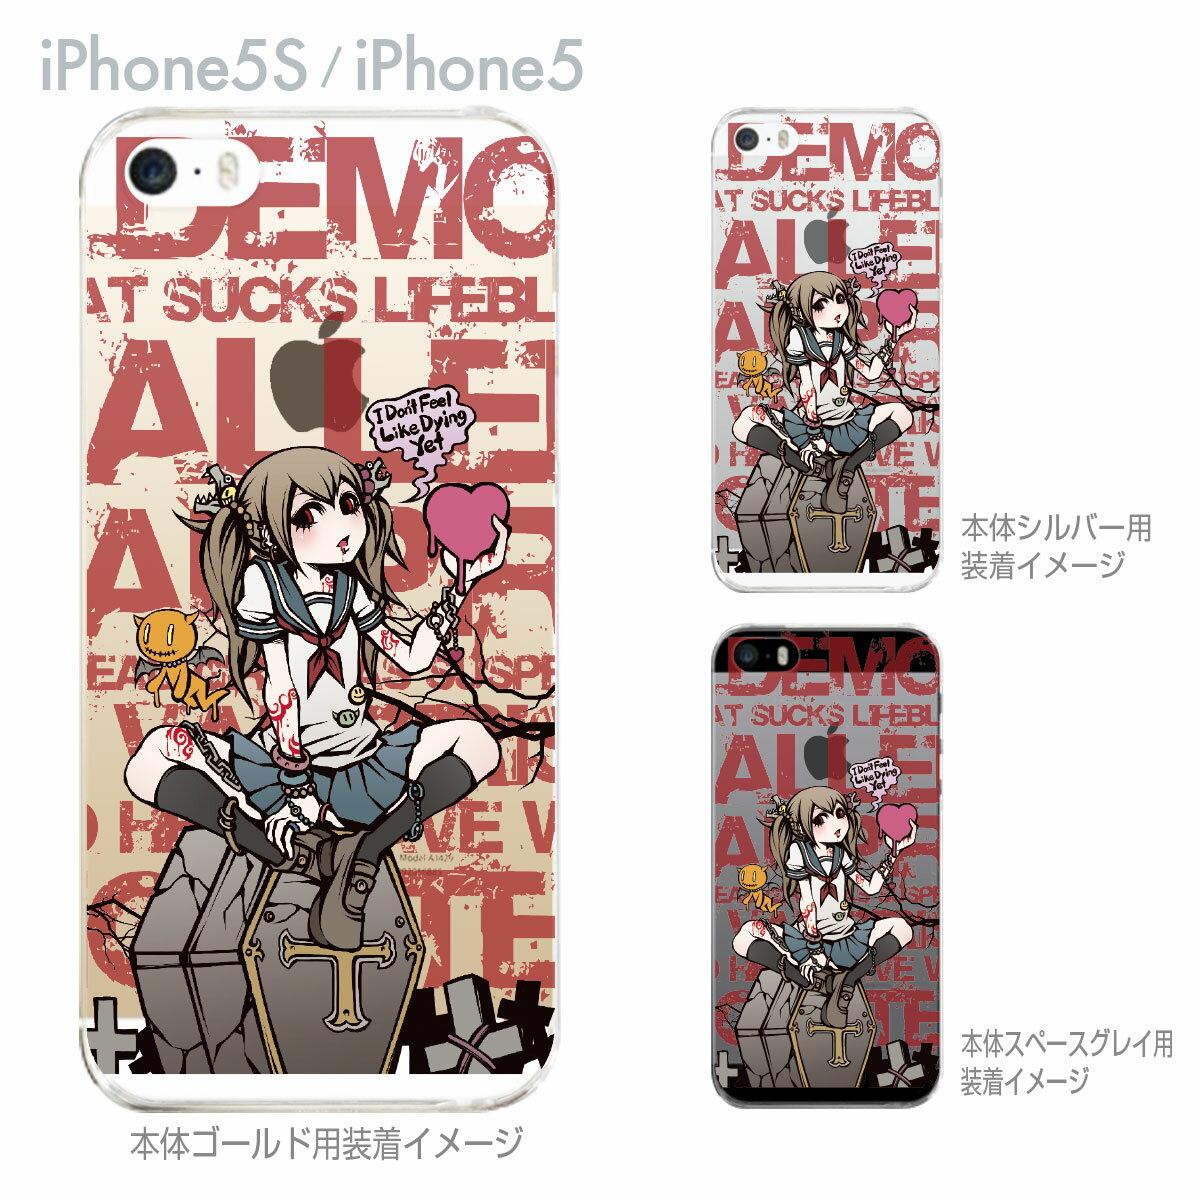 iPhone5s iPhone5 iPhone SE Clear Arts iPhone ケース カバー スマホケース クリアケース ハードケース【Project.C.K.】【プロジェクトシーケー】【ZOMBIE】 11-ip5s-ck0003s